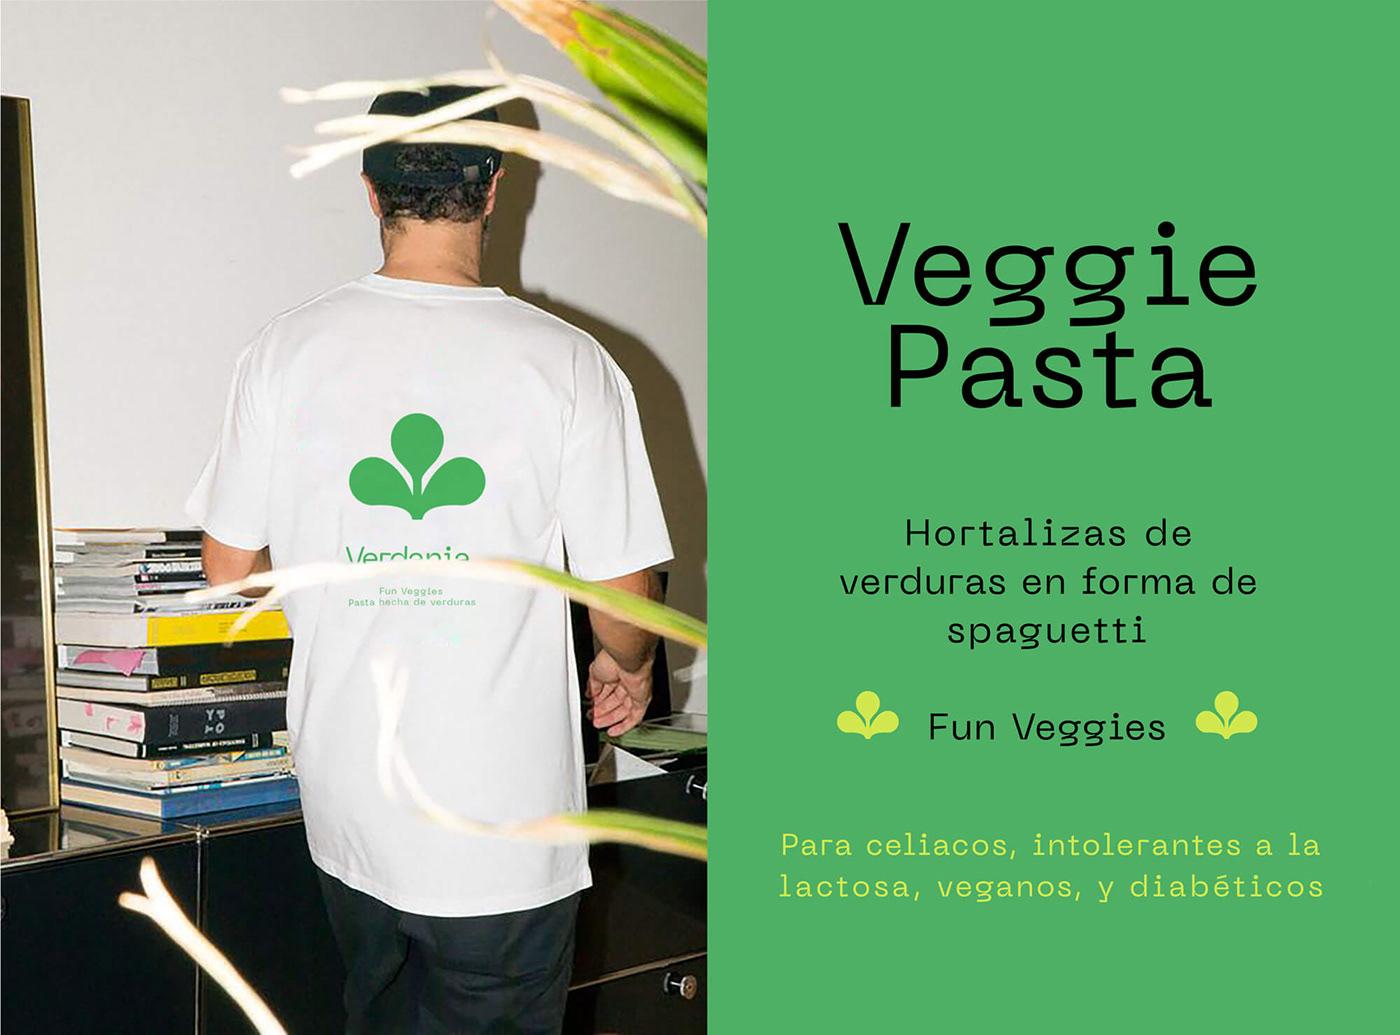 branding  color natural noodles organic Packaging planet vegan green vegetables